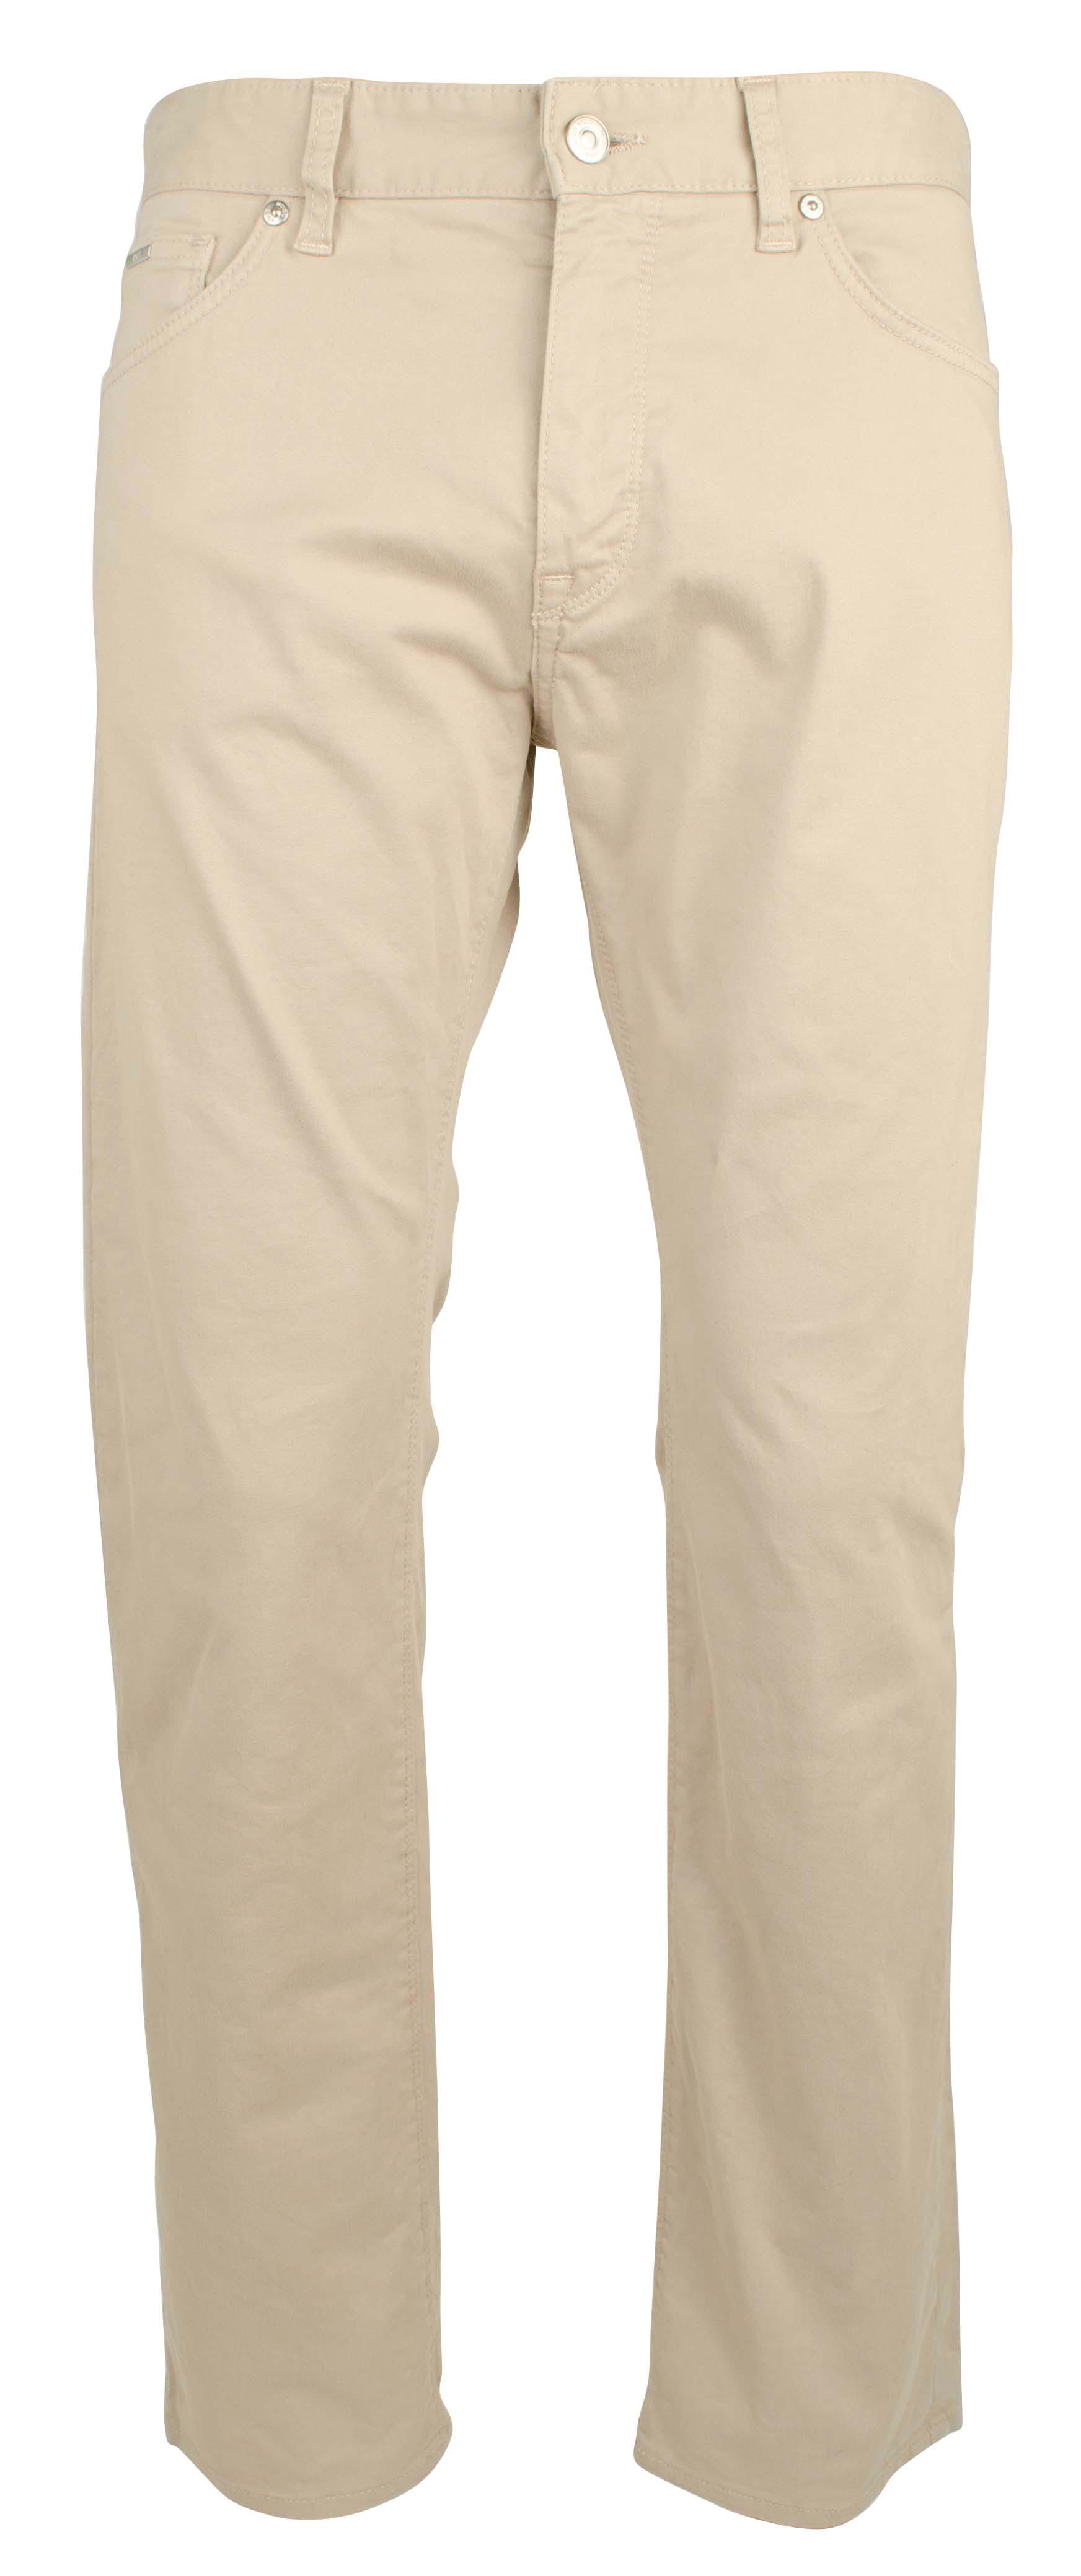 b4461496c3d8 Hugo Boss Maine Men s Regular Fit Stretch Pant